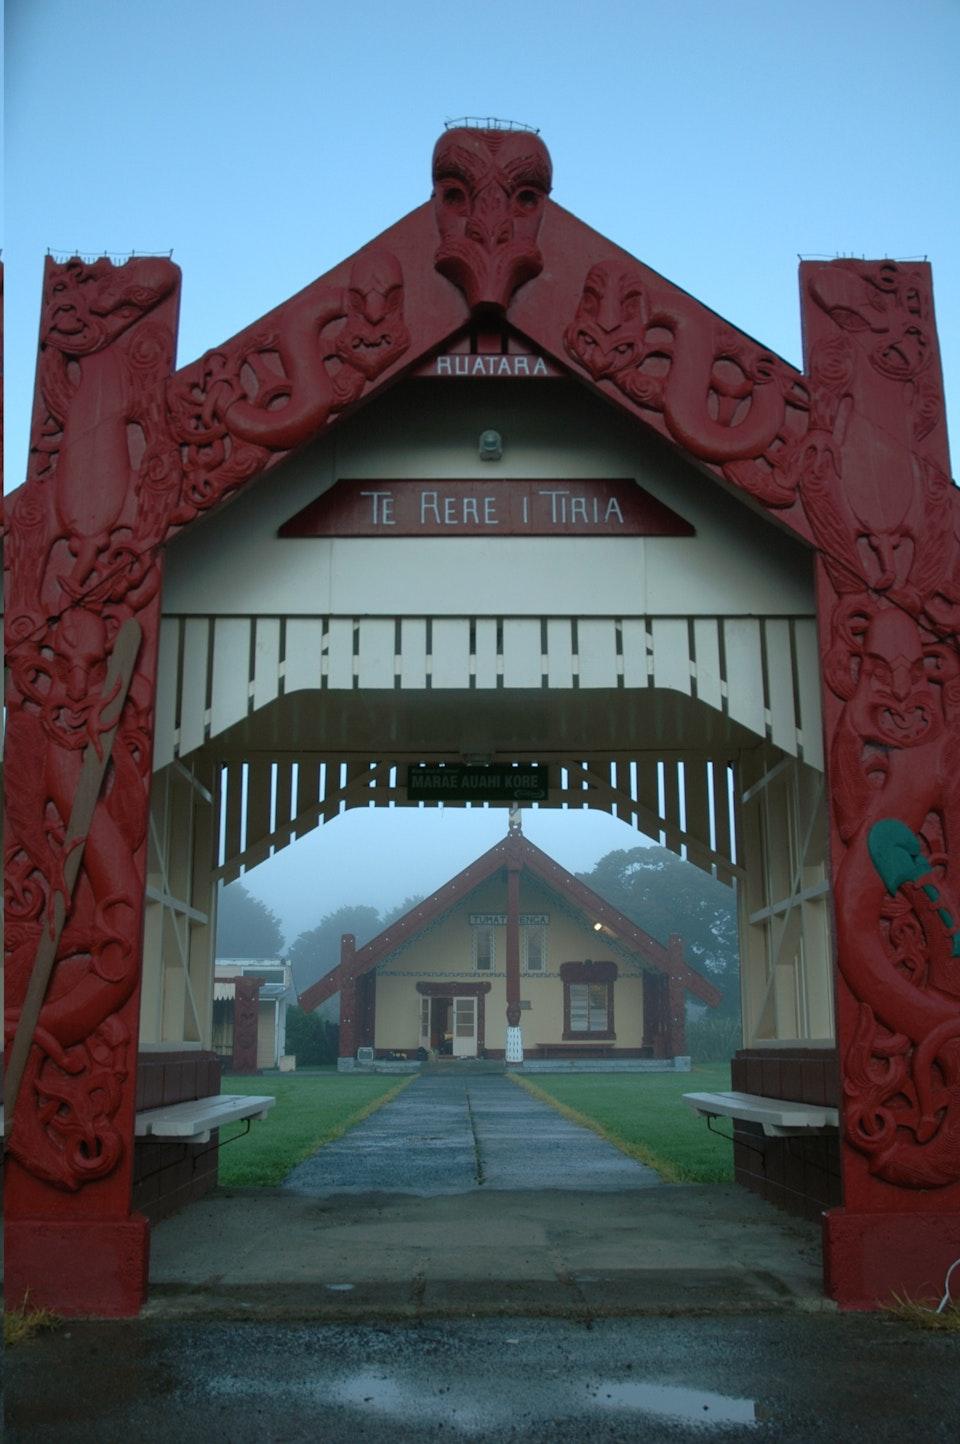 patu ihu  - Otiria Marae entrance